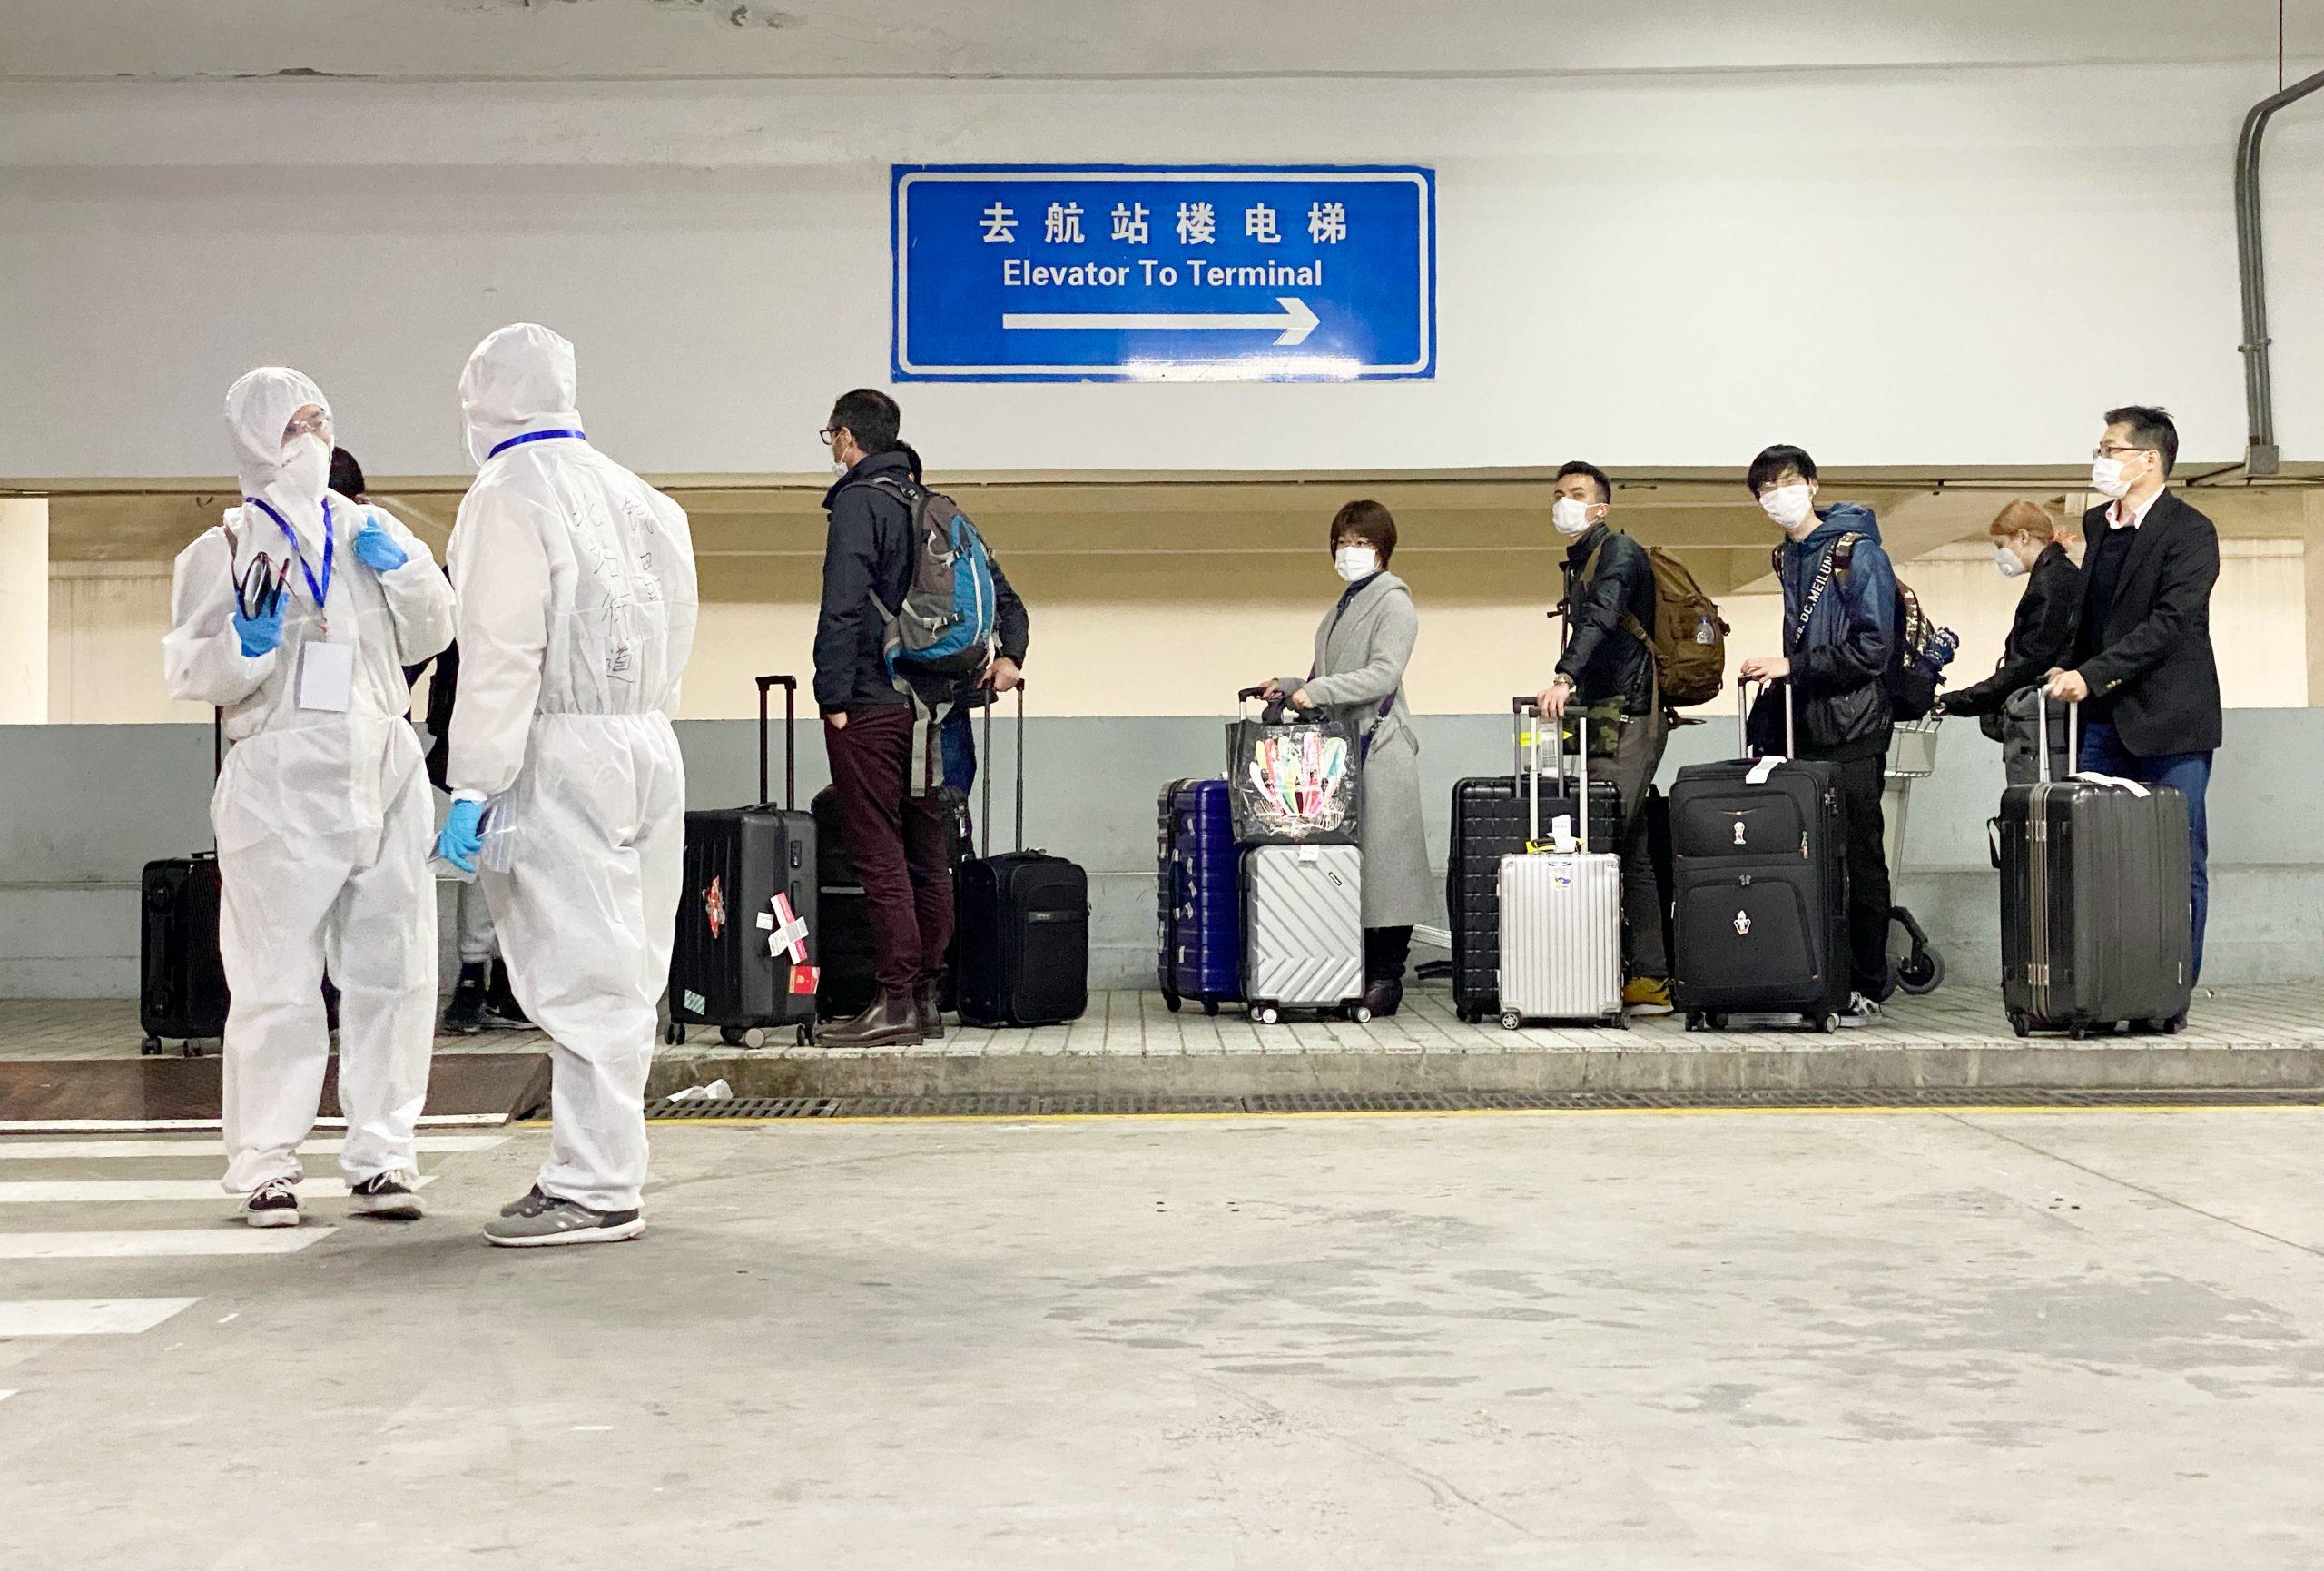 Realizan prueba de ácido nucleico a personal de carga de aeropuerto Pudong de Shanghai